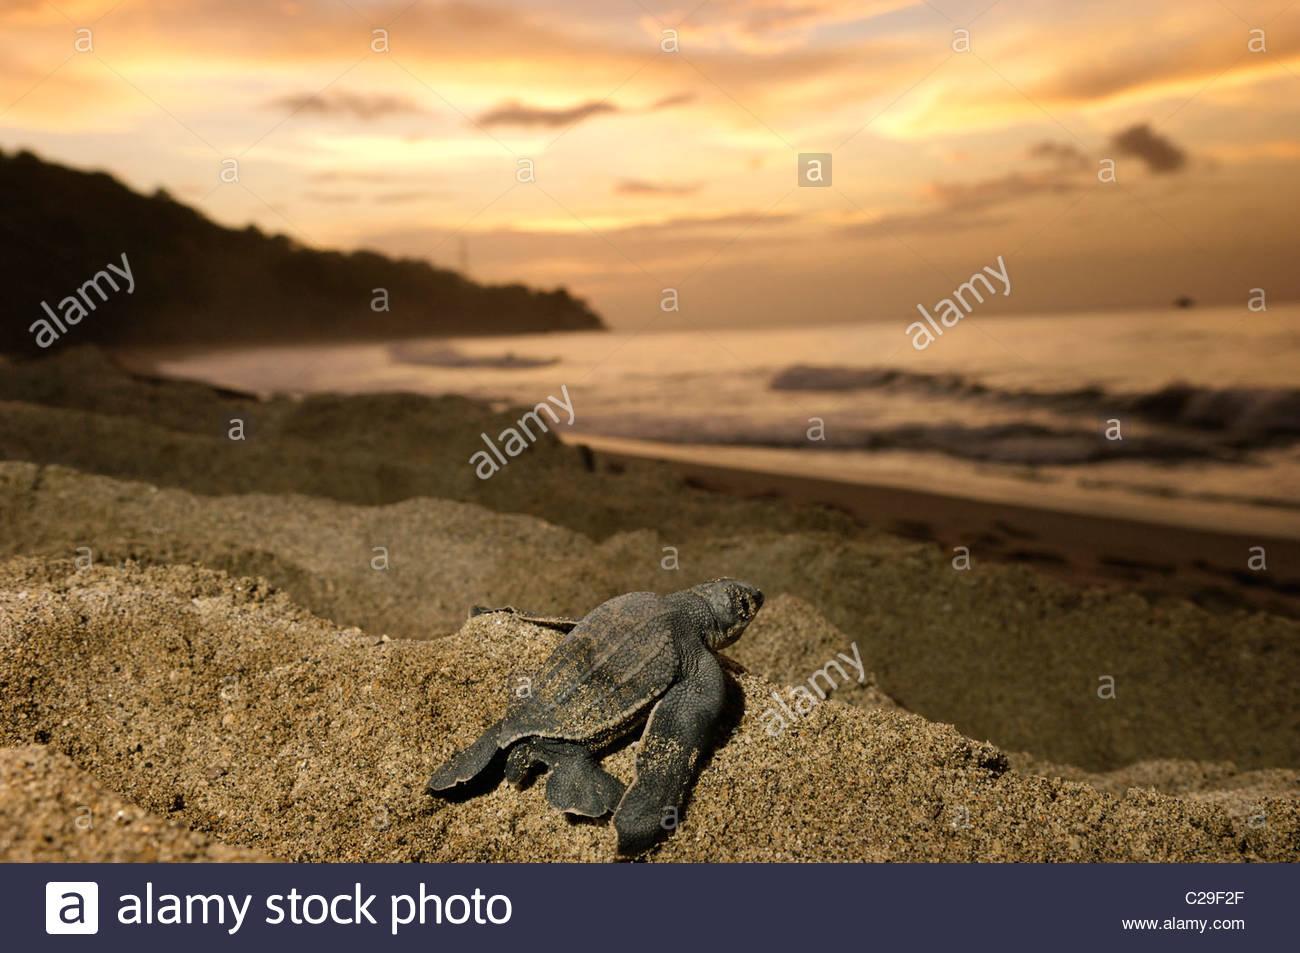 A leatherback turtle hatchling crawls toward the sea. - Stock Image